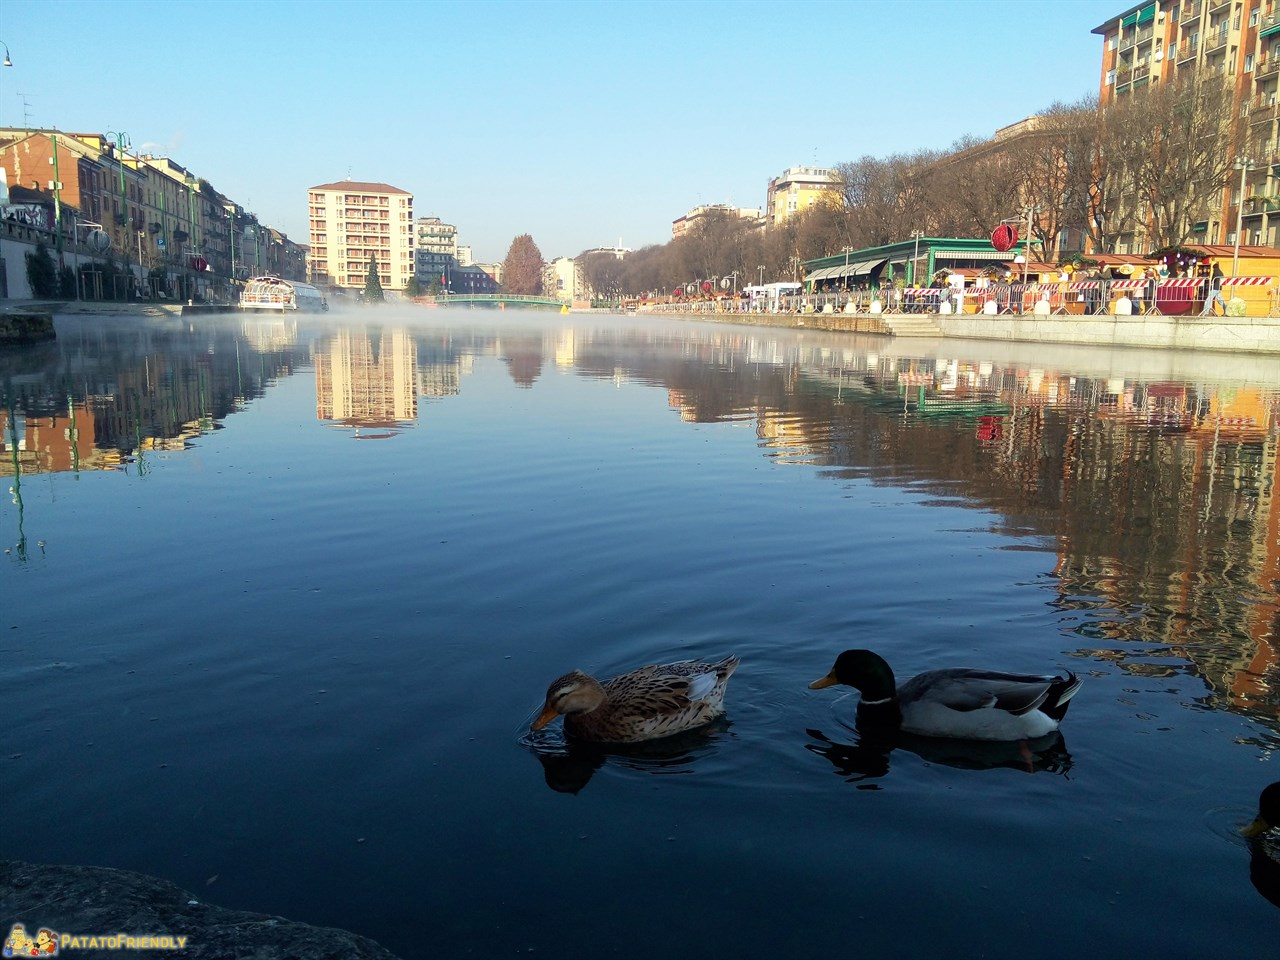 [cml_media_alt id='9033']La Darsena di Milano a Natale[/cml_media_alt]